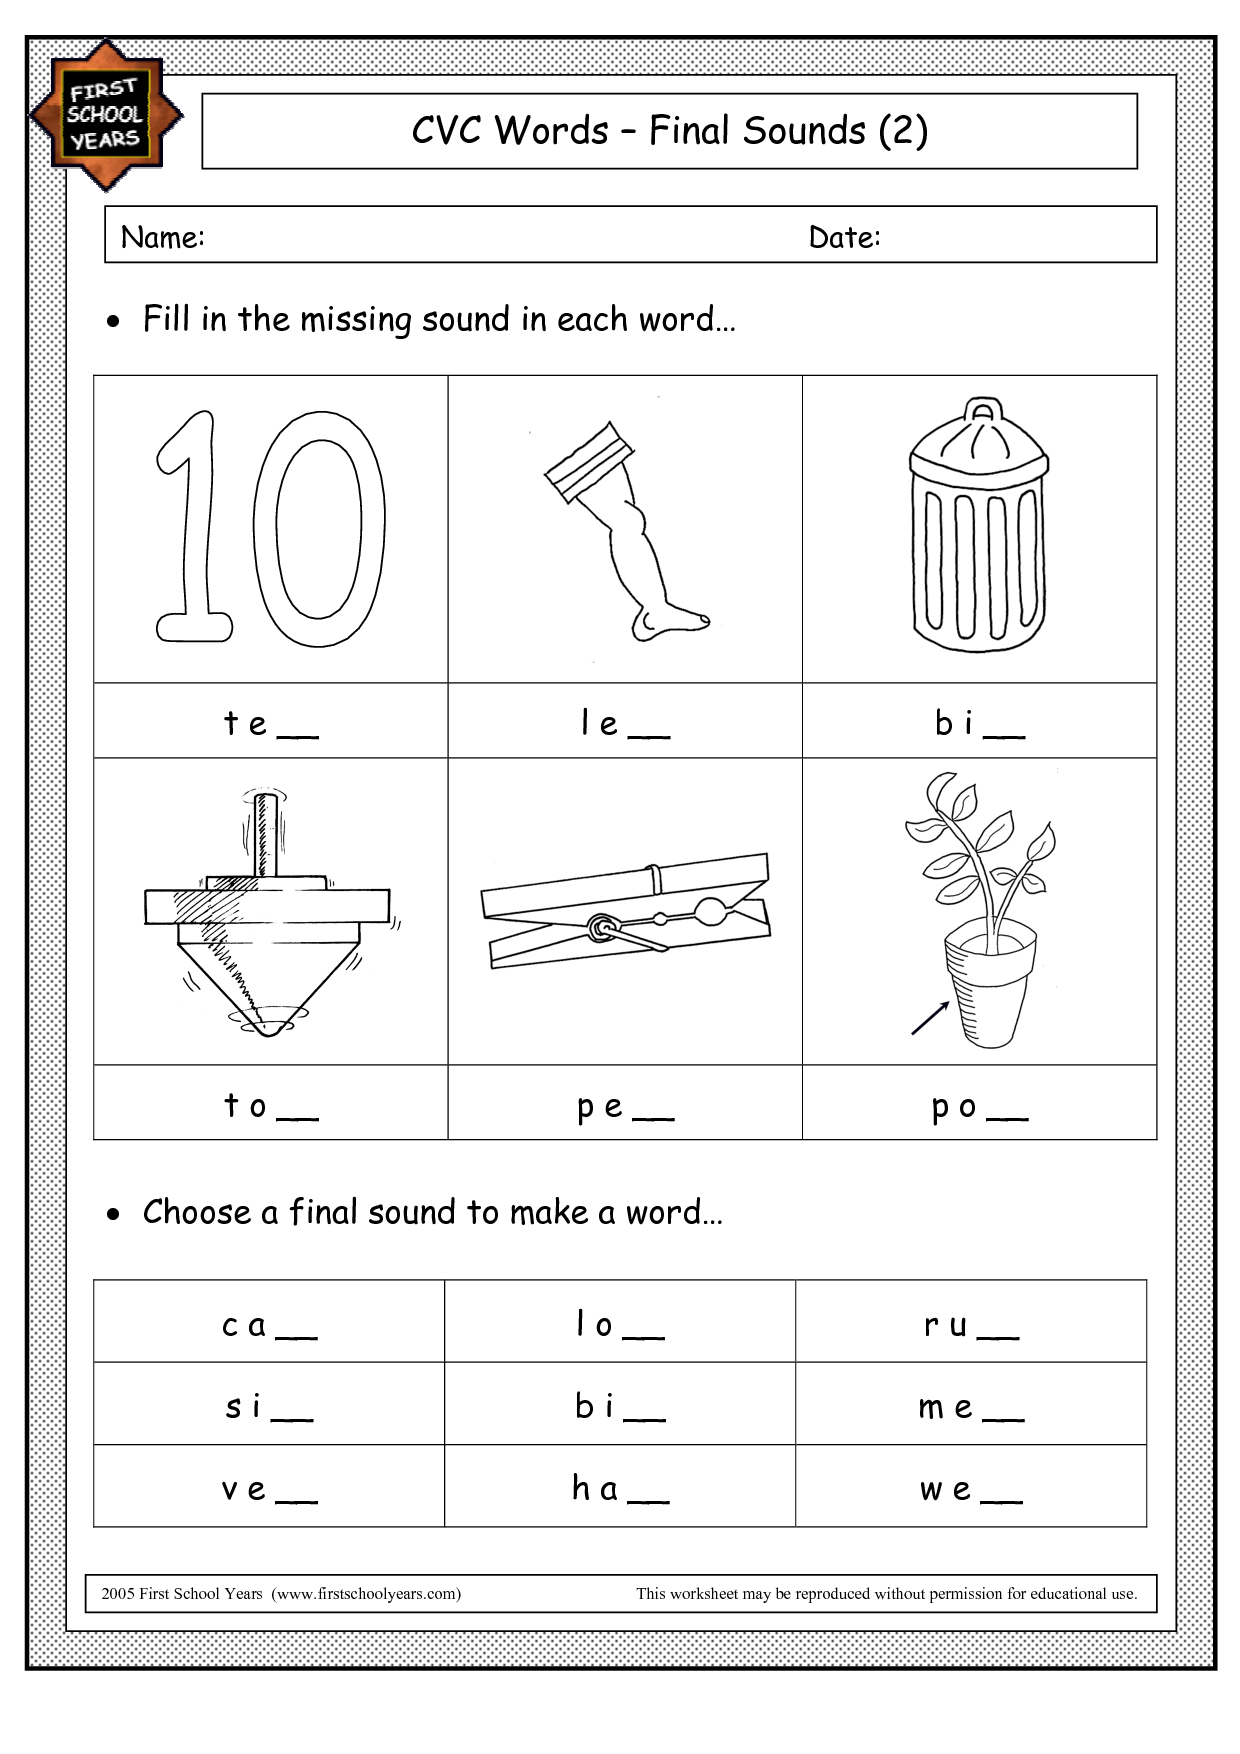 hight resolution of ending sound worksheet   Cvc words